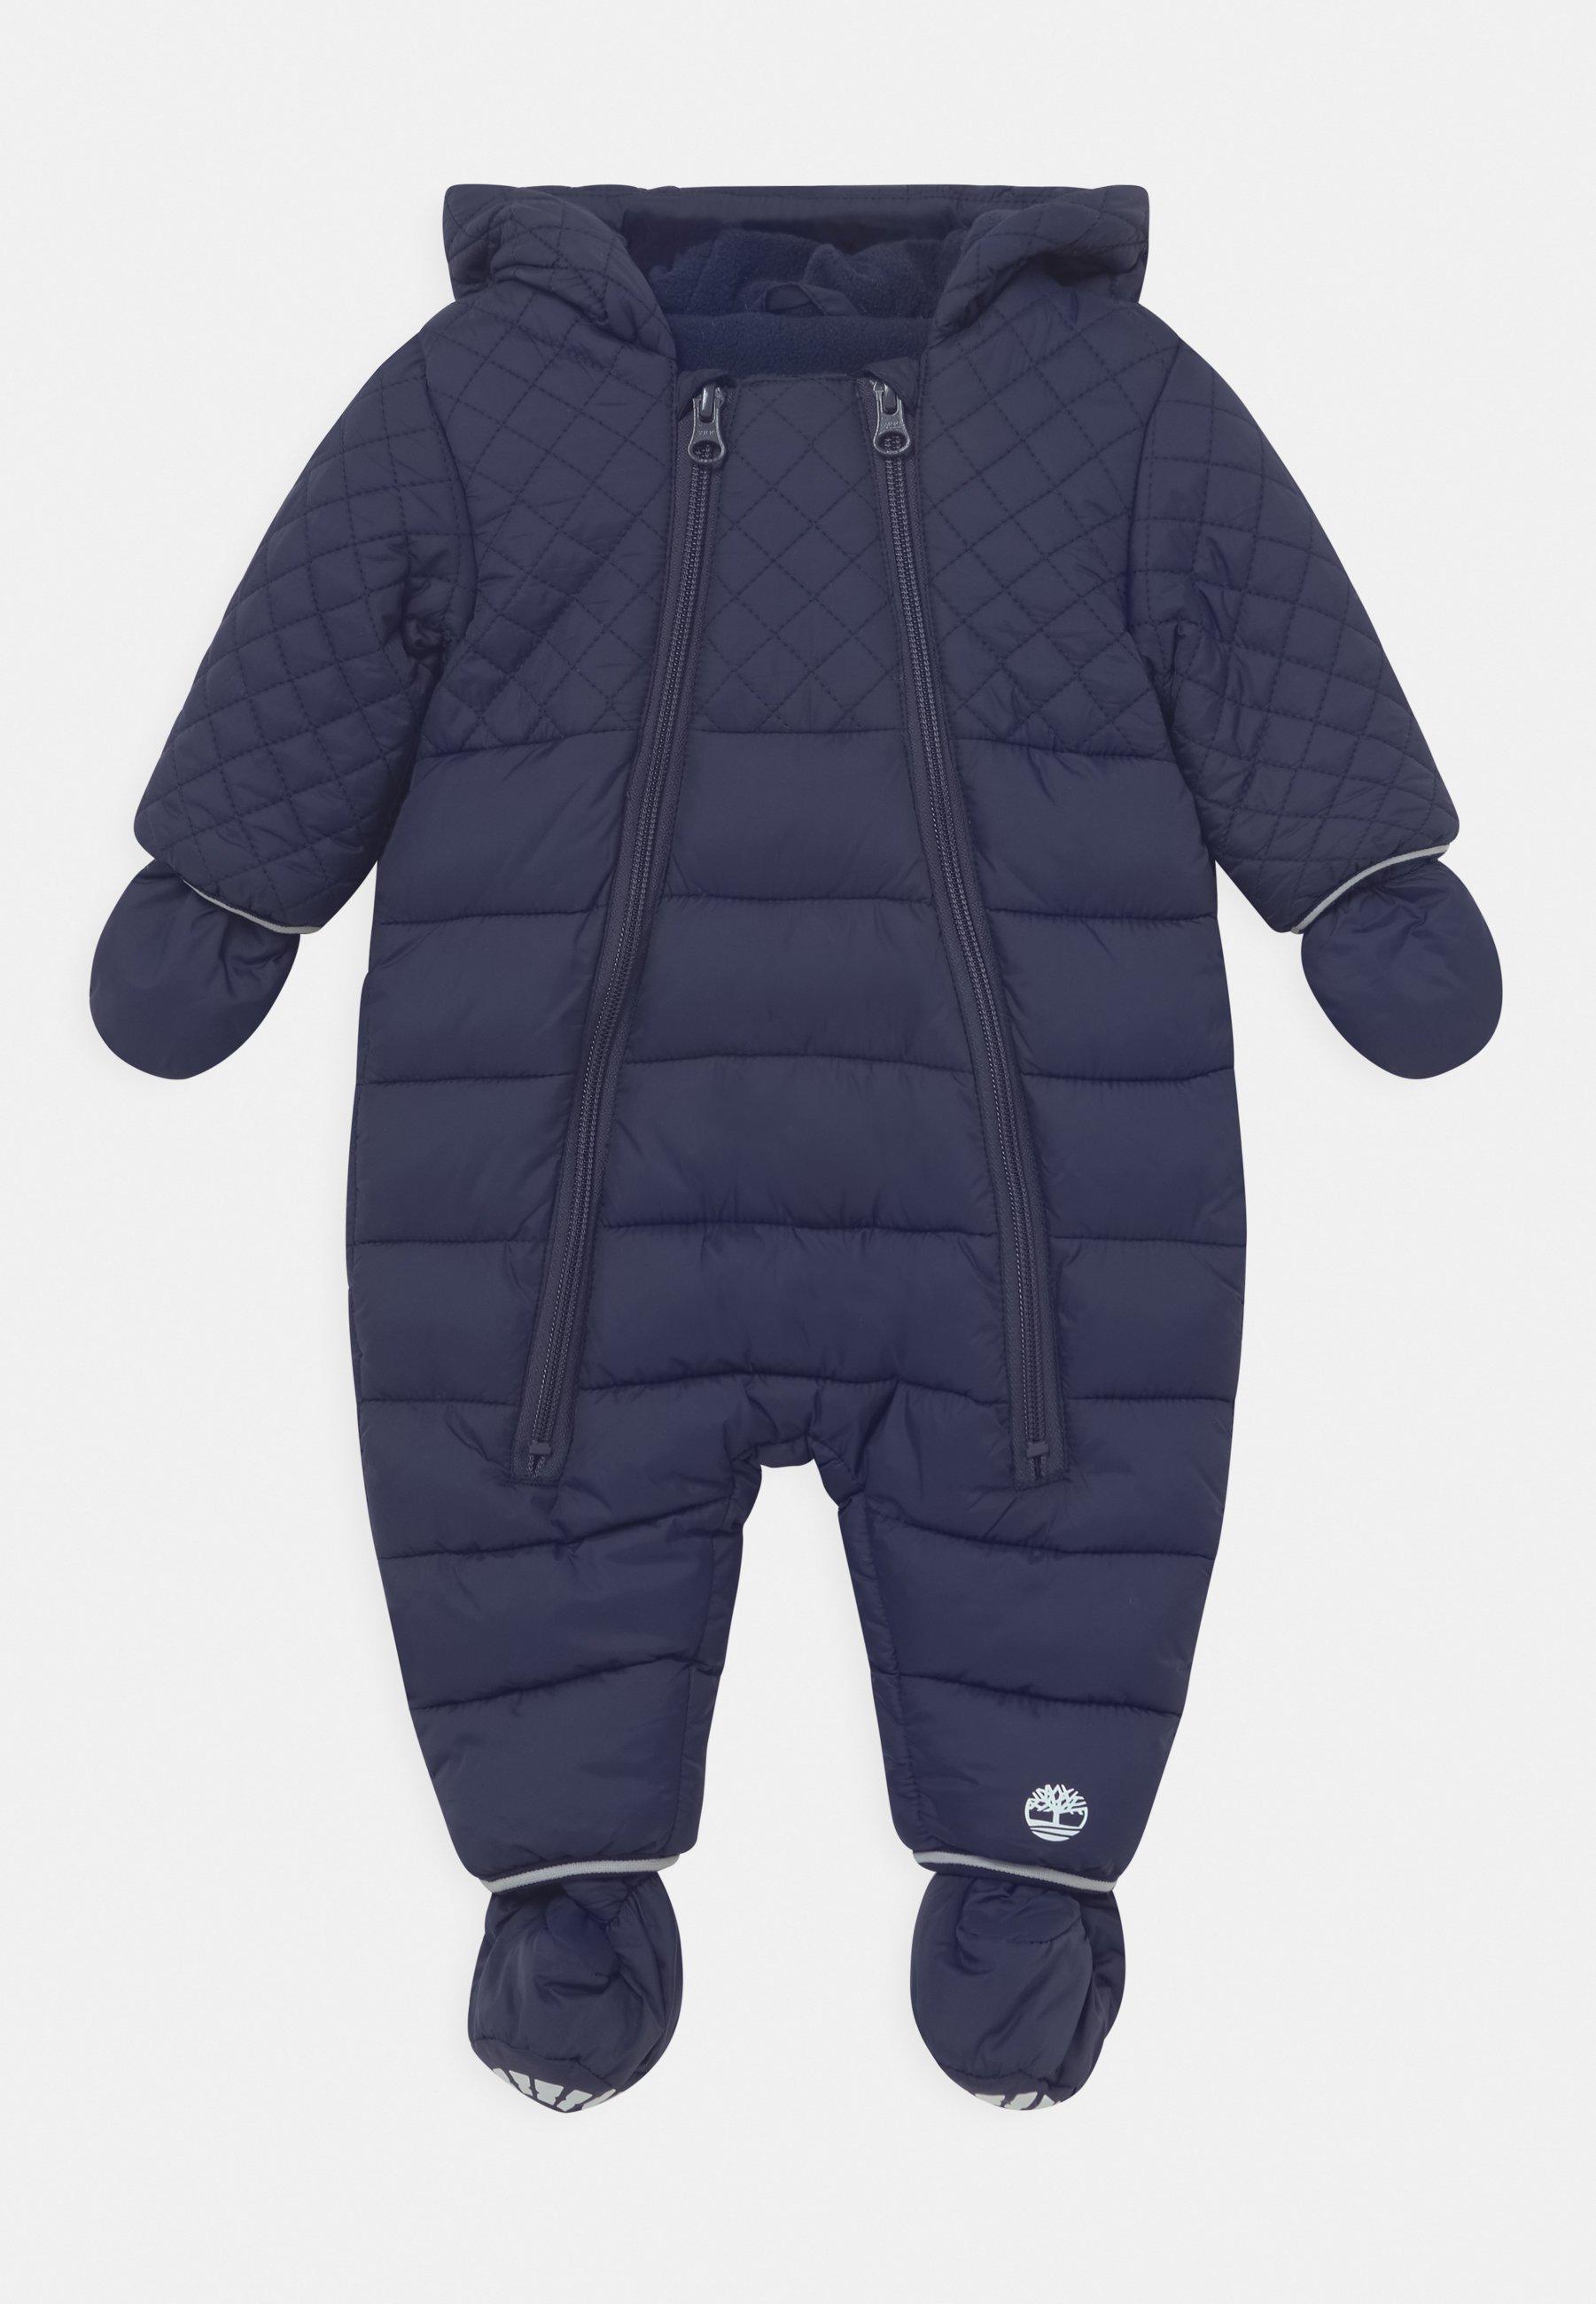 Niño ALL IN ONE - Mono para la nieve